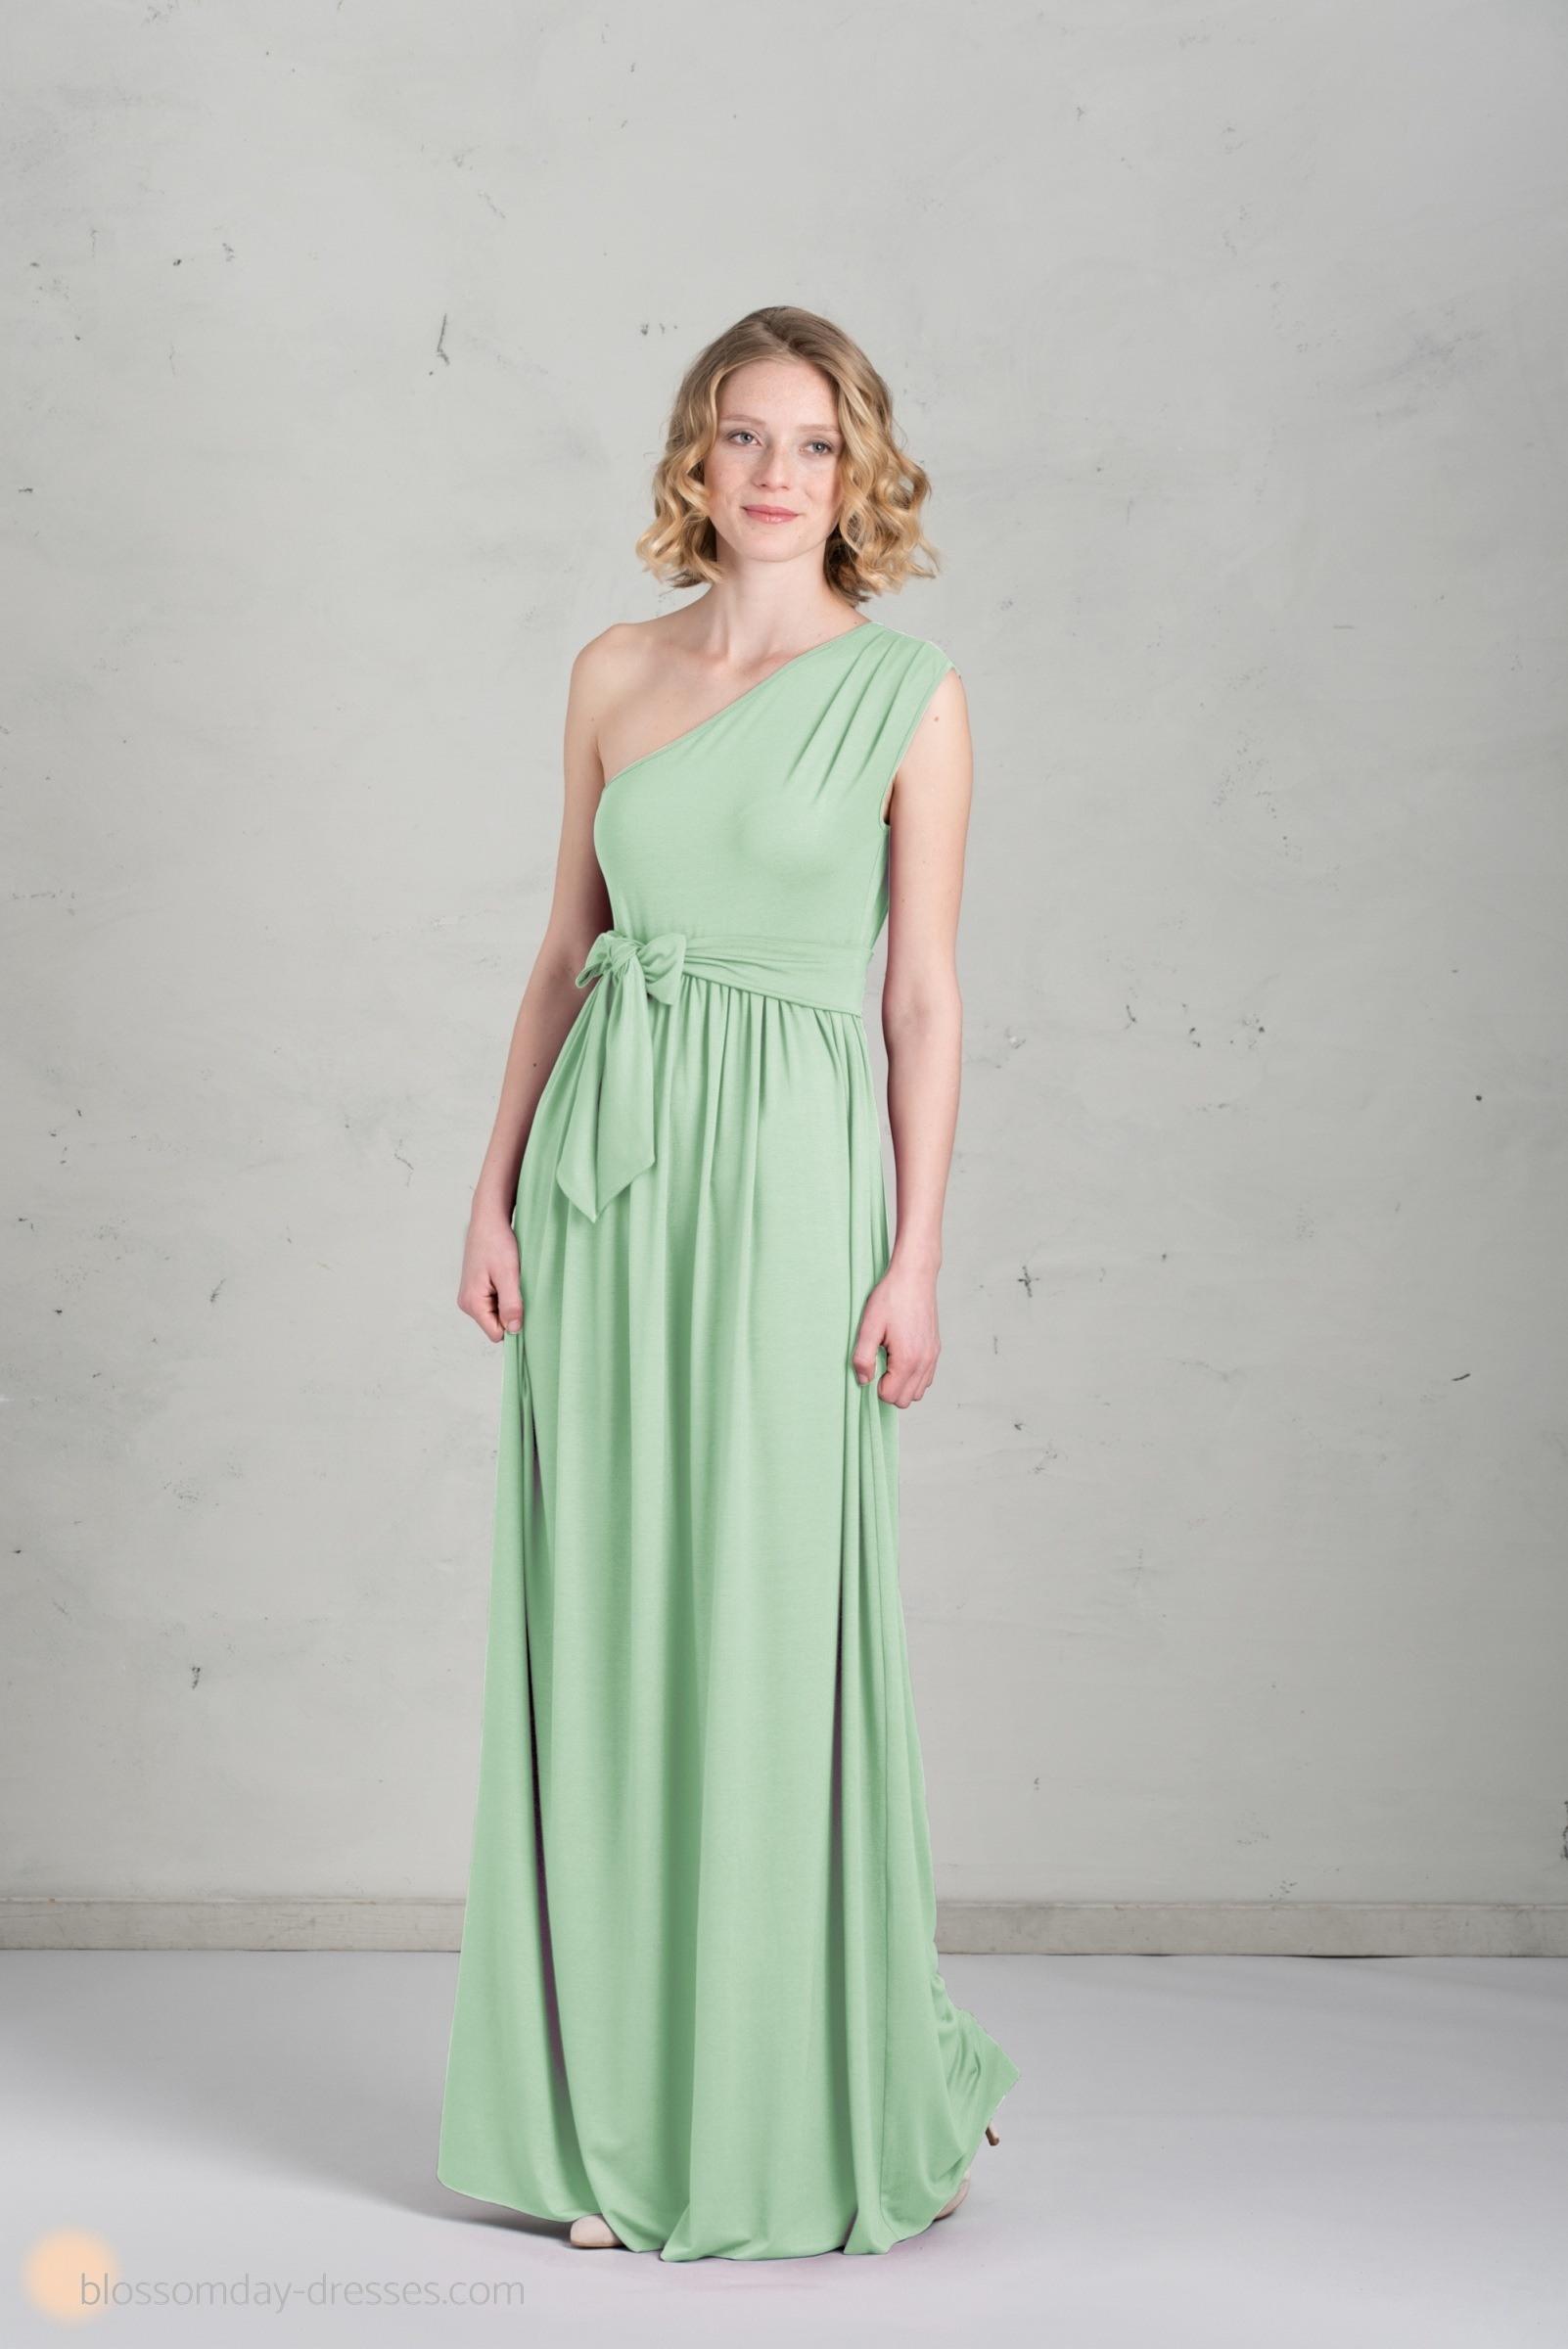 Formal Schön Mint Kleid Lang Spezialgebiet20 Spektakulär Mint Kleid Lang Stylish